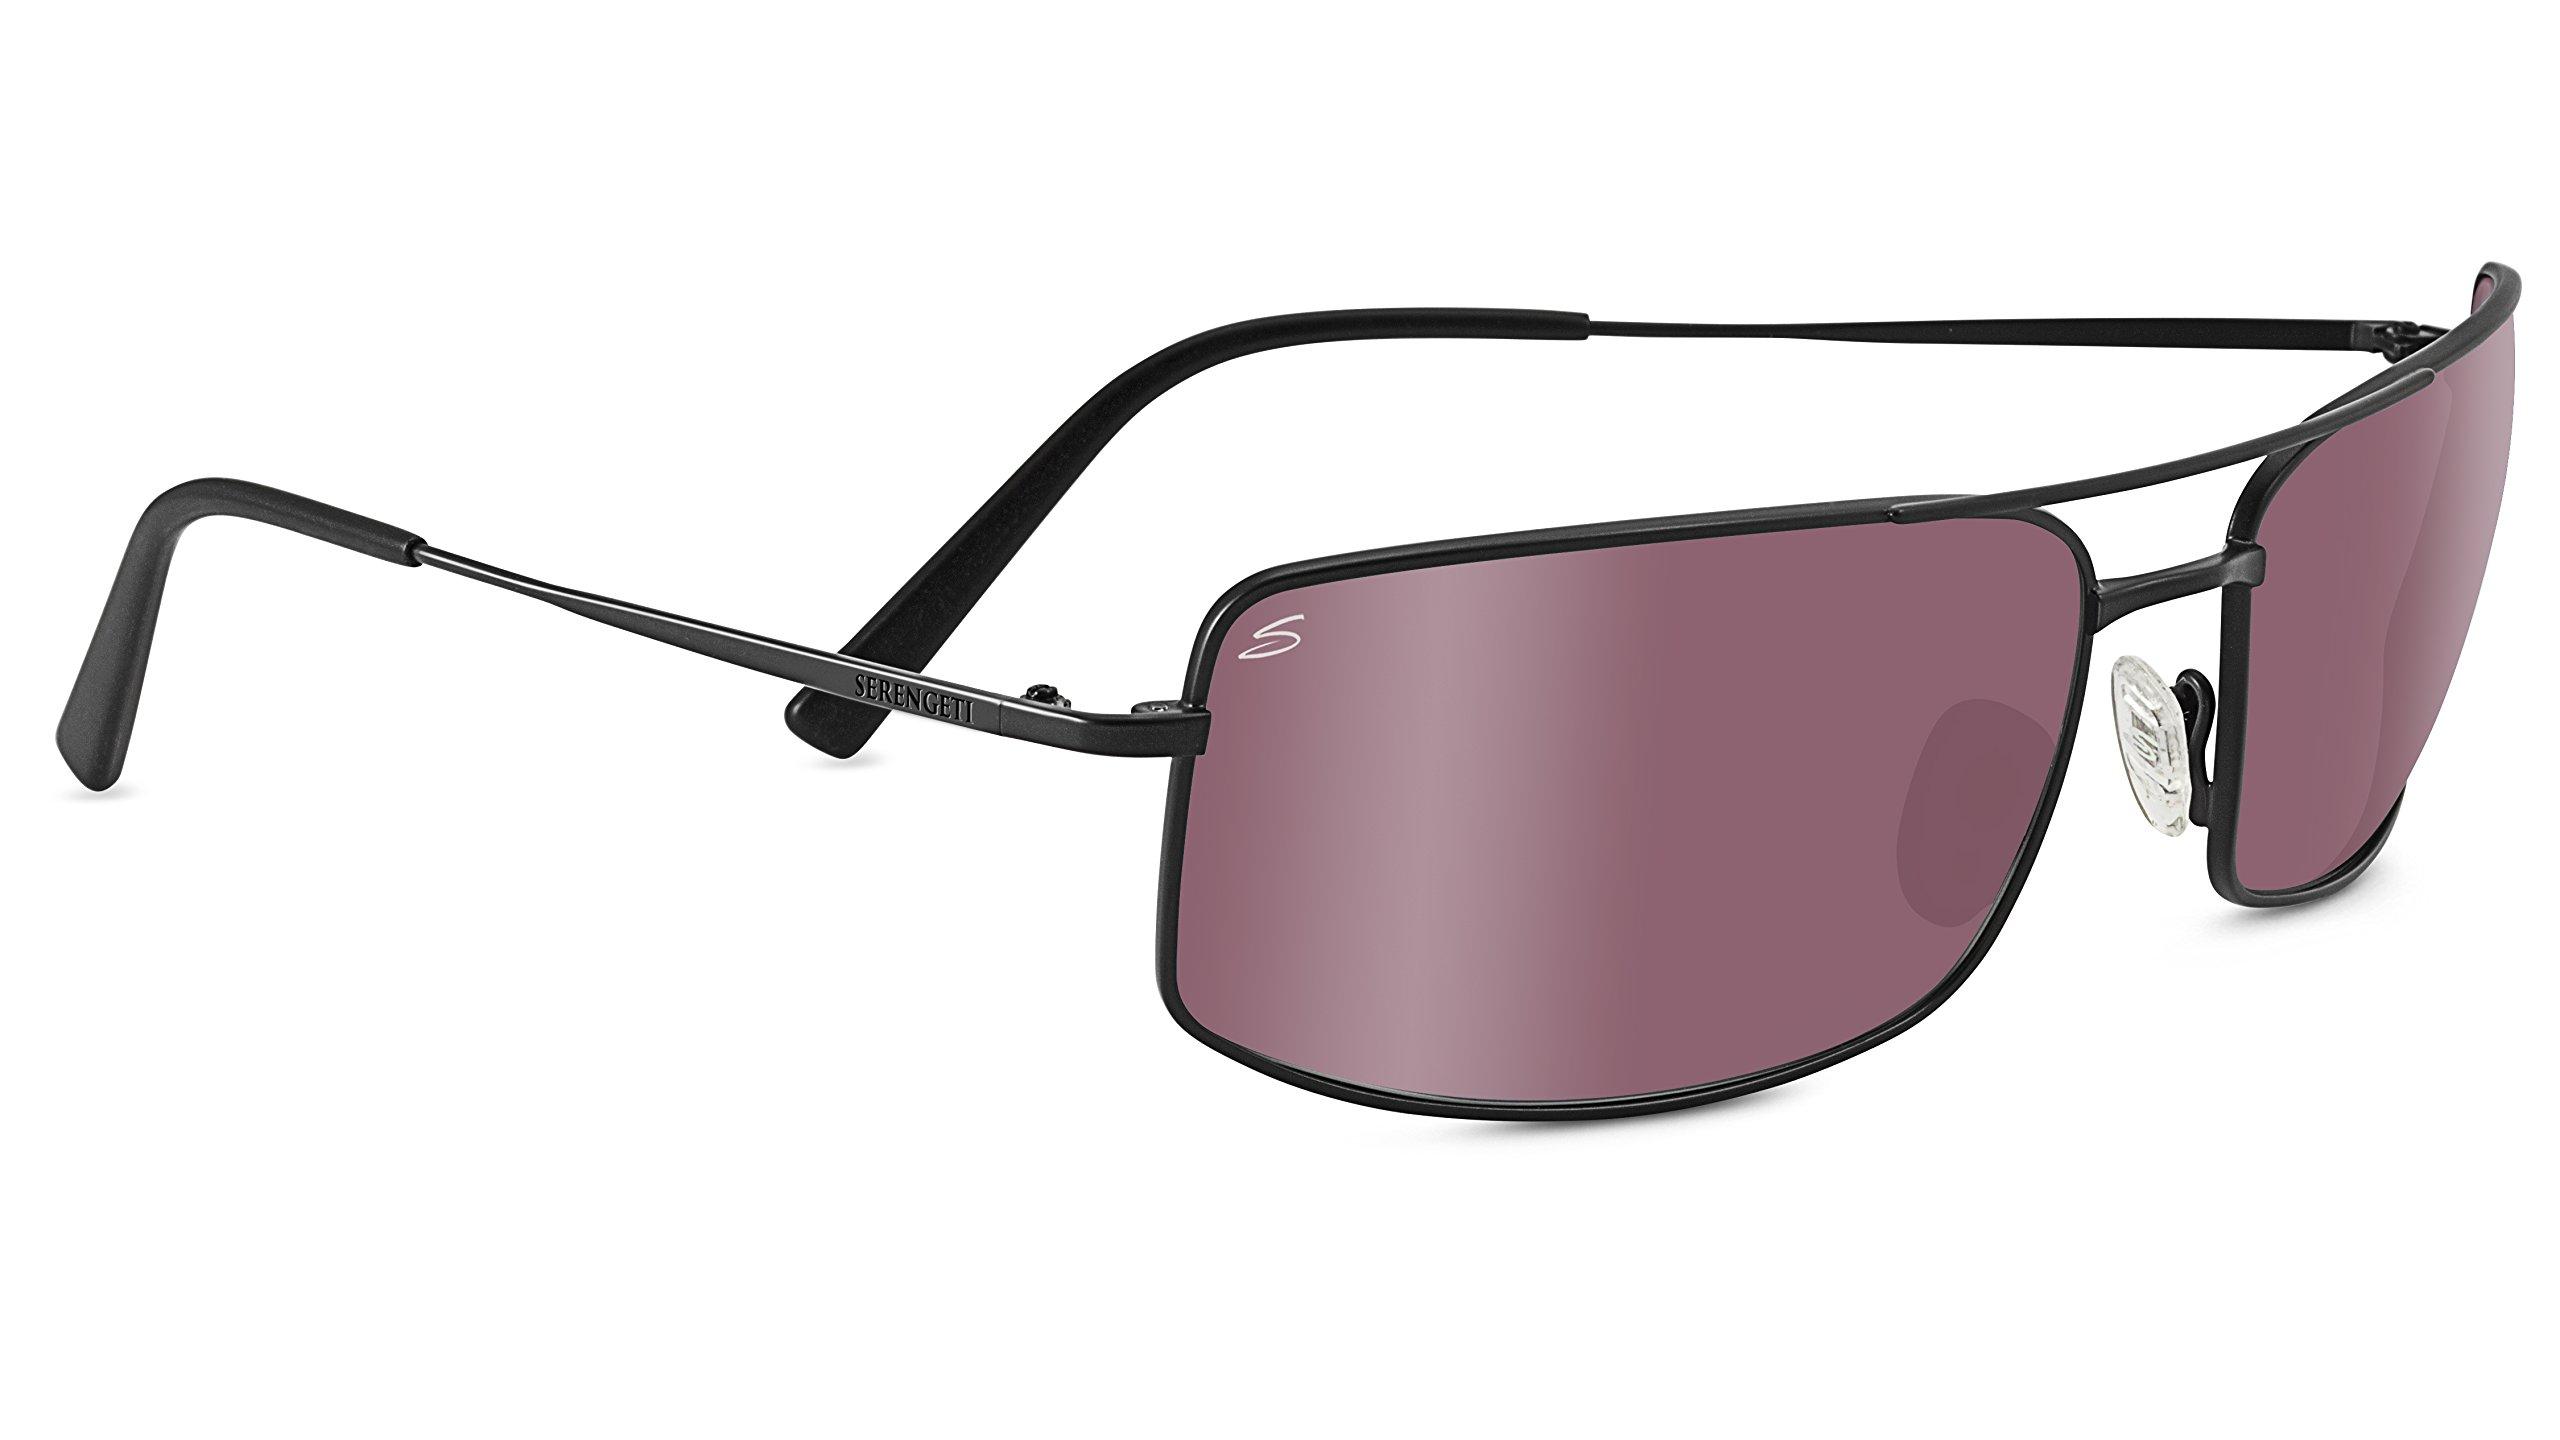 Serengeti 8440 Treviso Polarized Sedona Bi Mirror Sunglasses, Satin Black by Serengeti